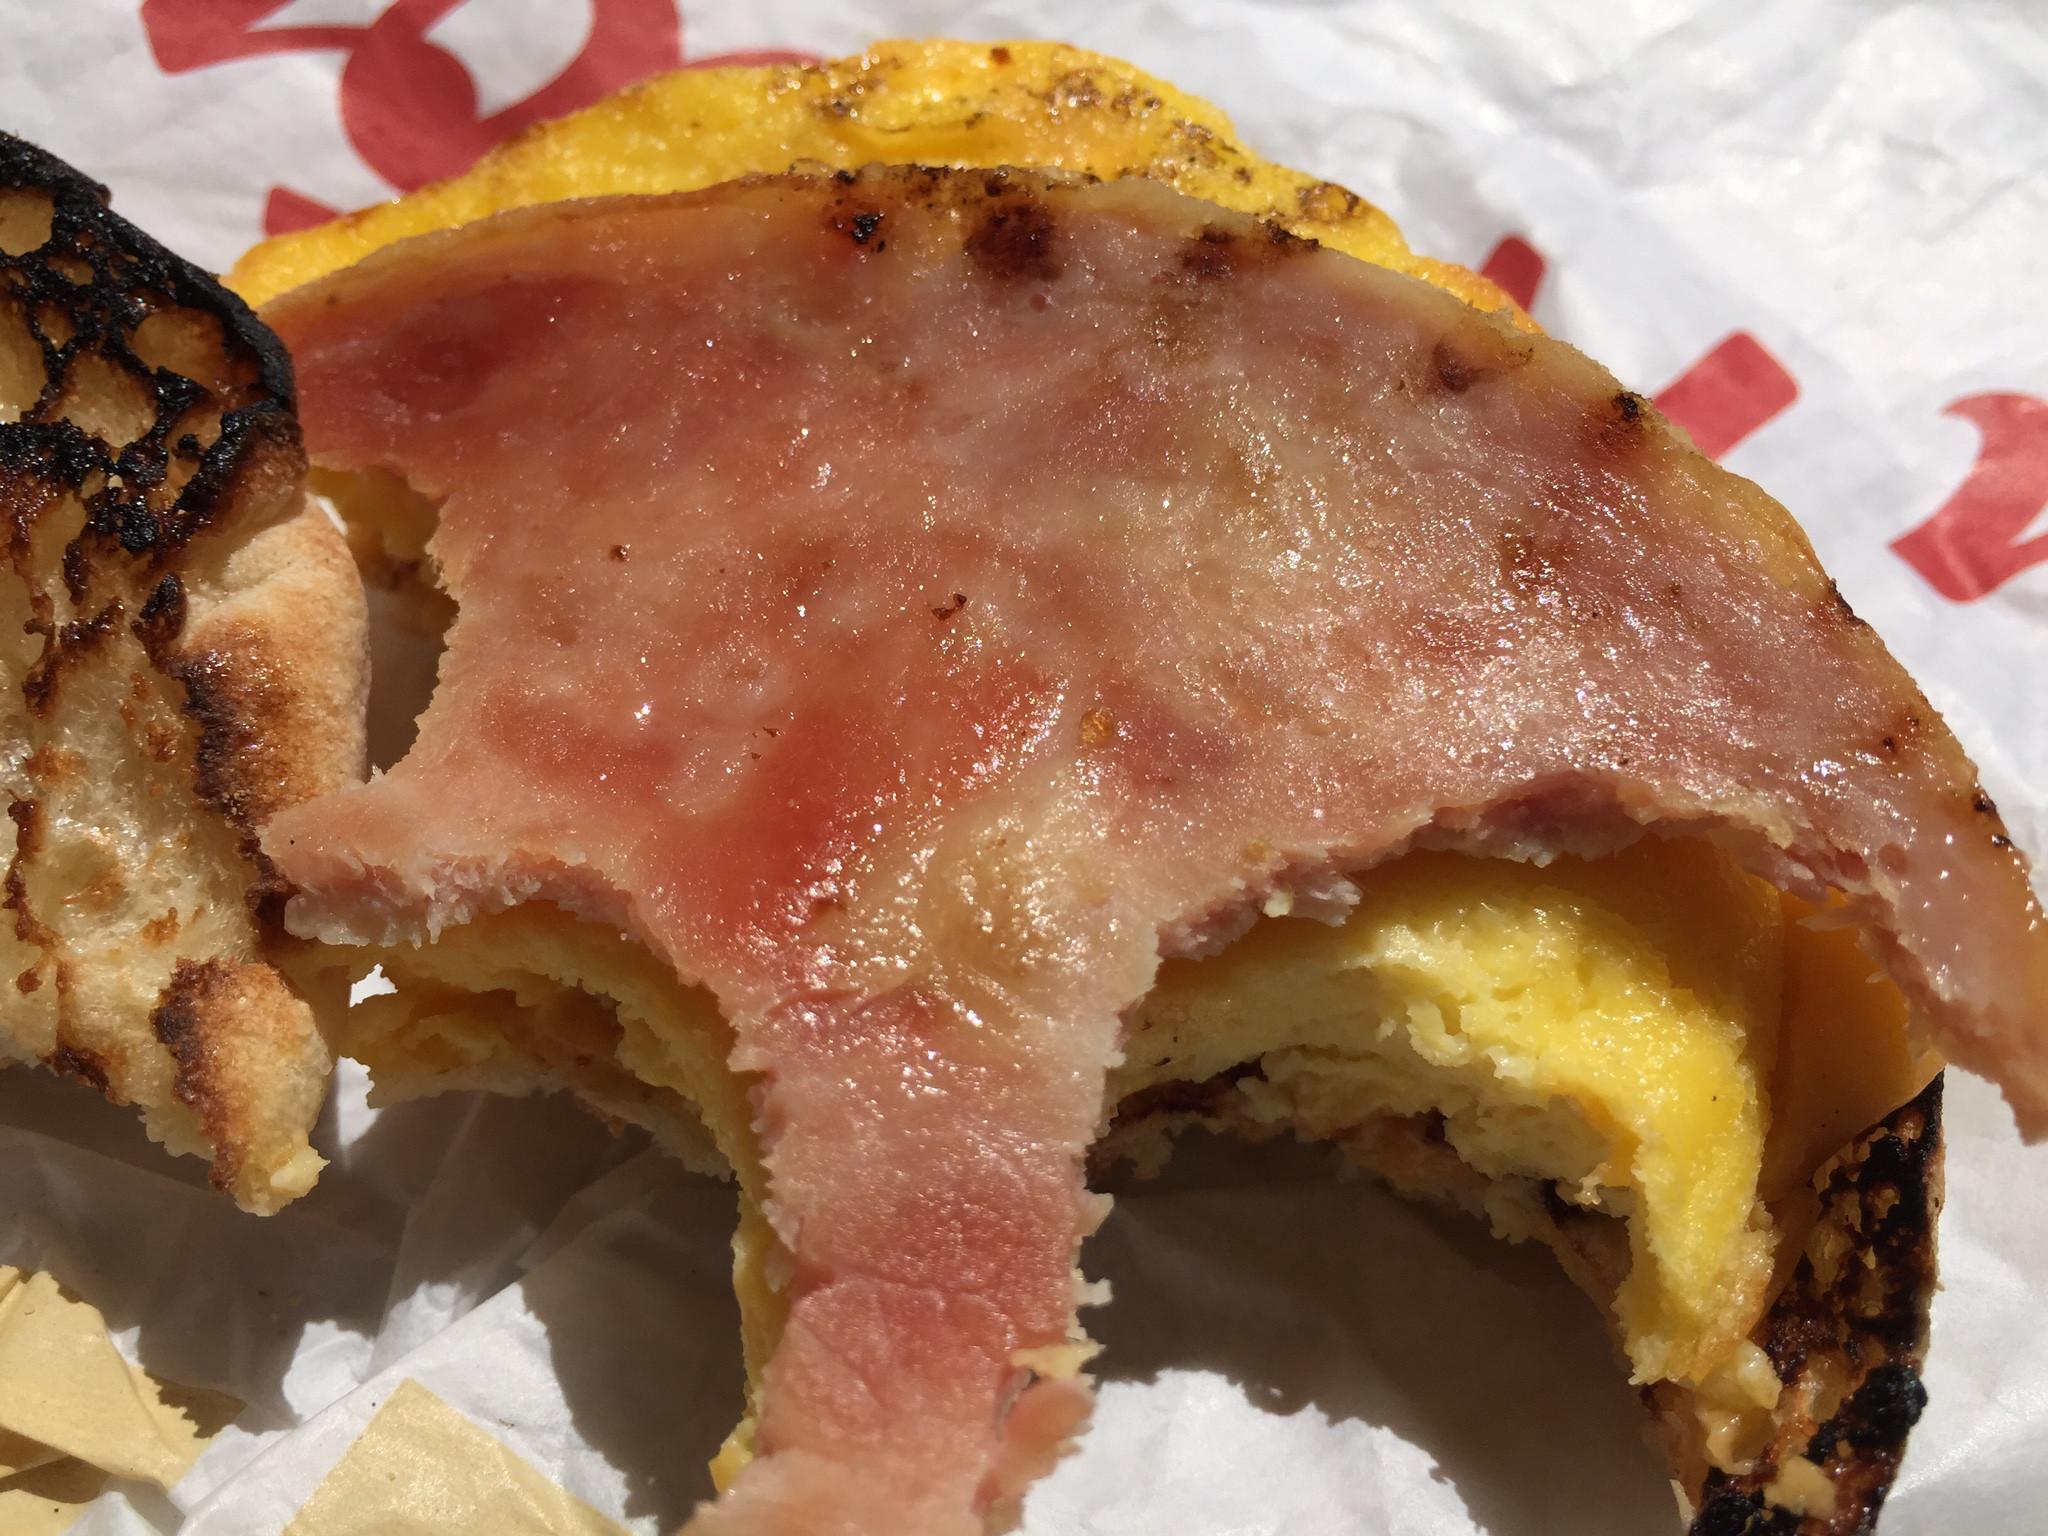 Tim Hortons Healthy Breakfast  Tim Hortons Back Bacon Breakfast Sandwhich – Inside Timmies